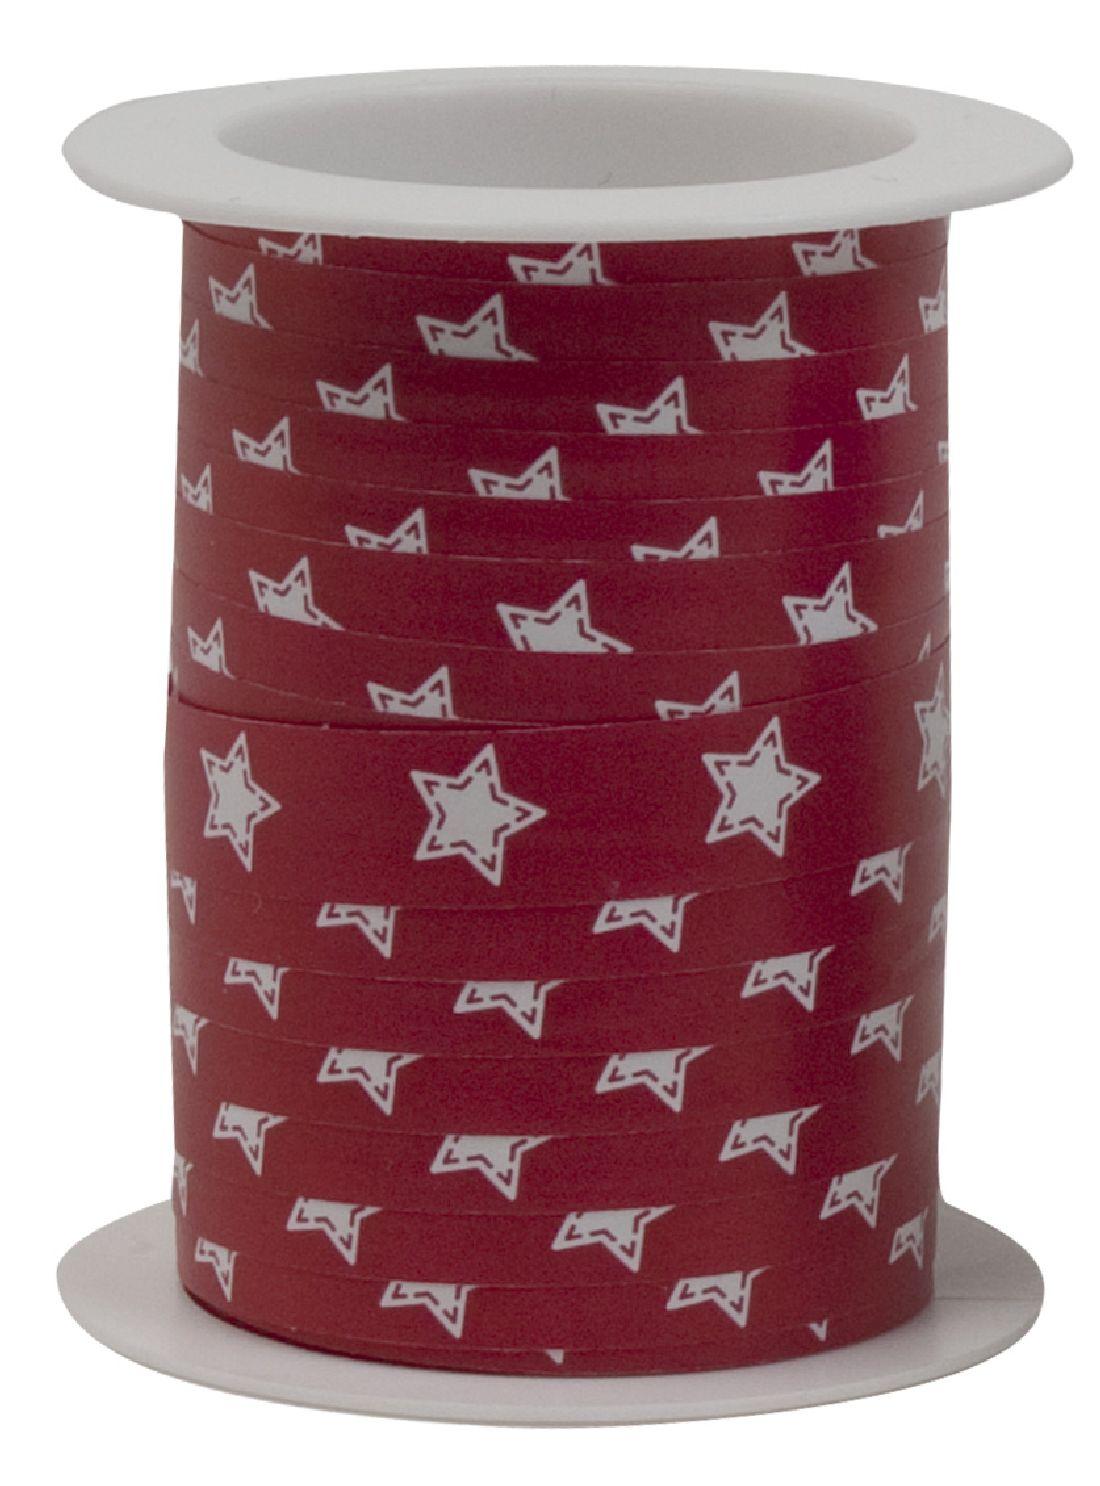 Polyband X-MAS Edition ROT-MATT Ringelband Weihnacht 10mm  150Meter Ziehband